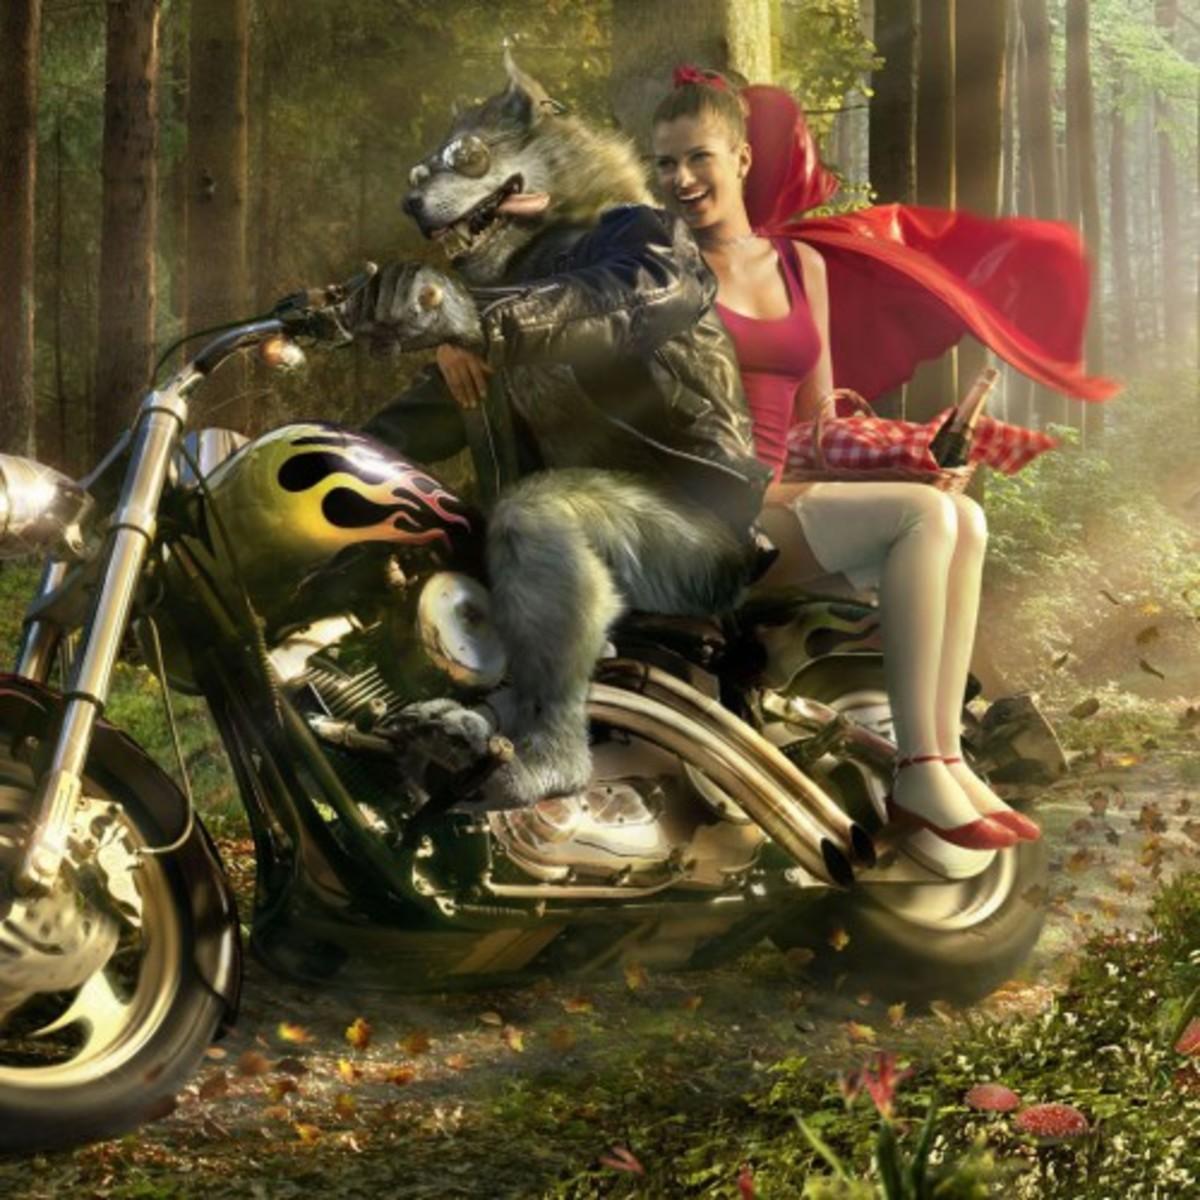 fairytale-parodies-100-words-short-stories